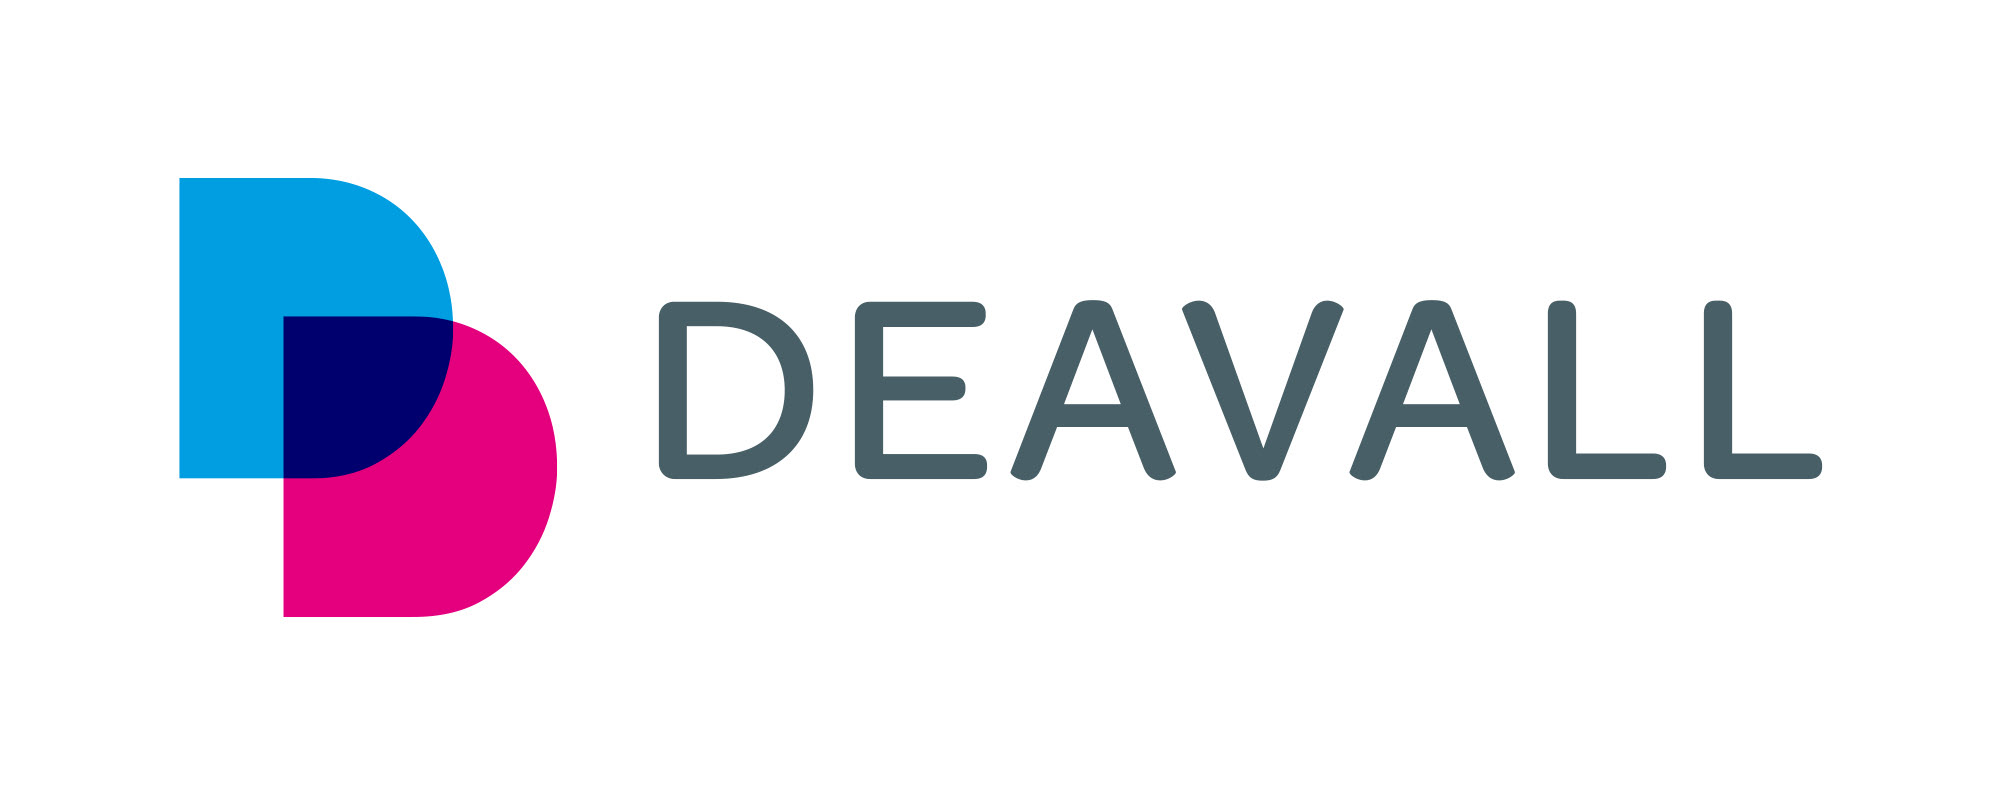 deavall design freelance graphic design branding online